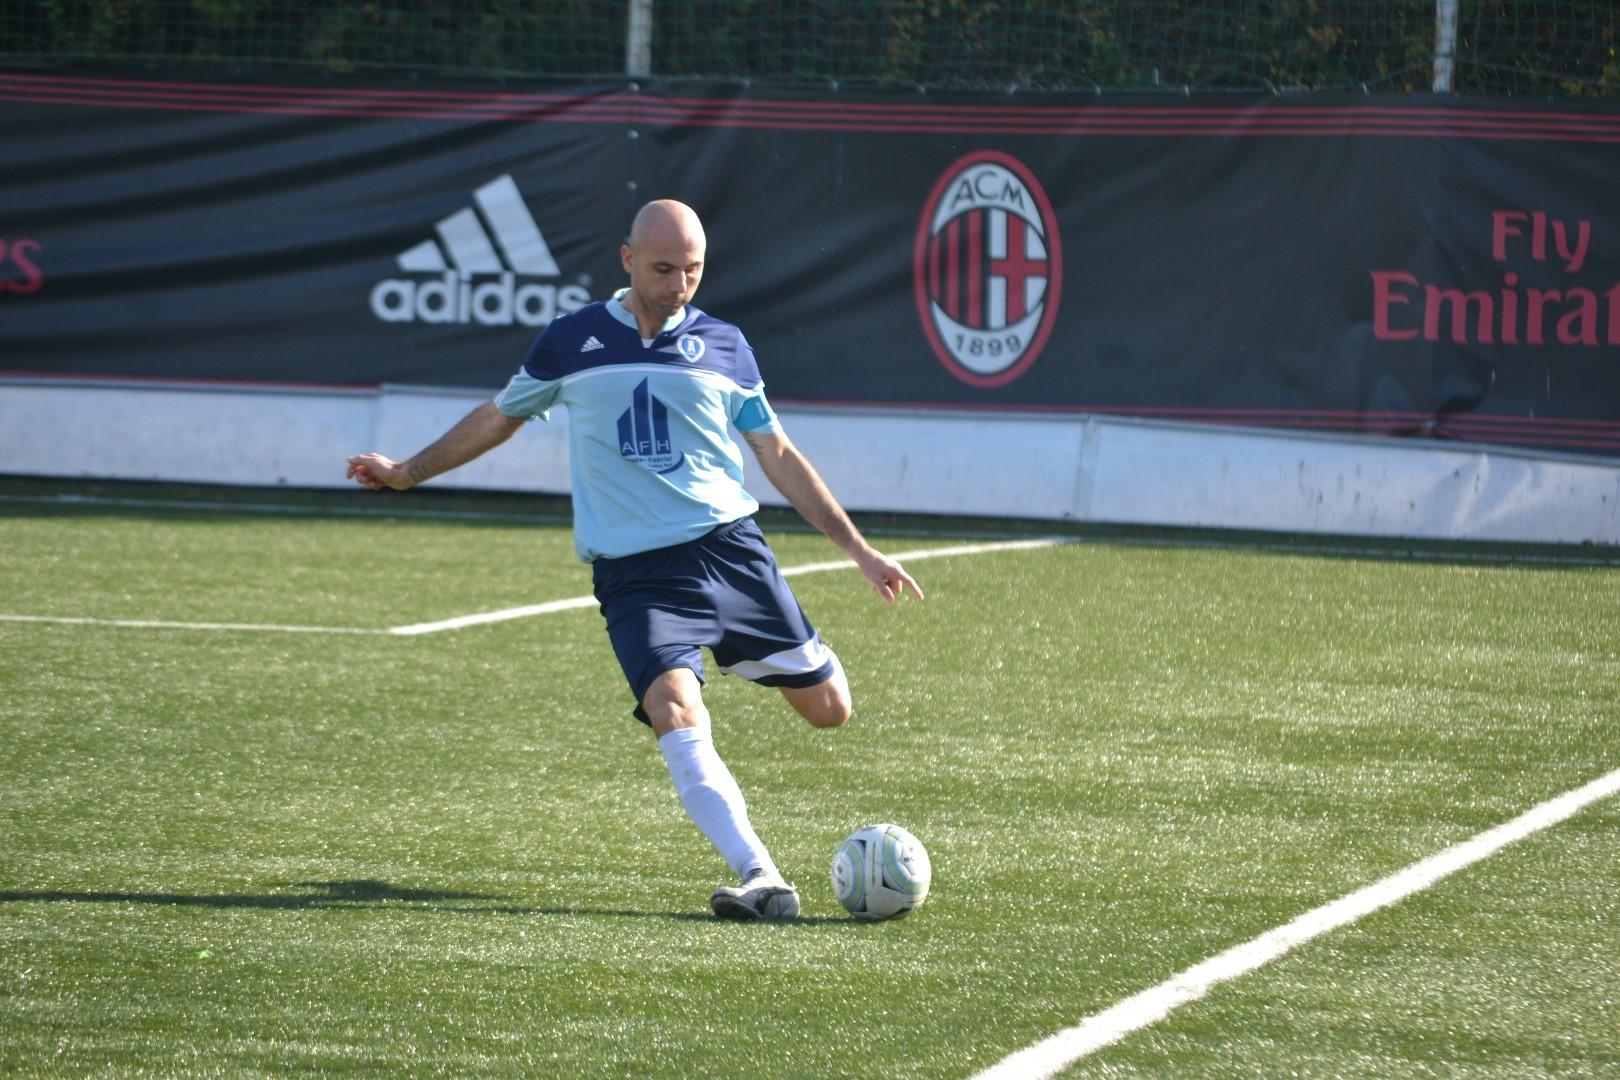 Maurizio Battistelli